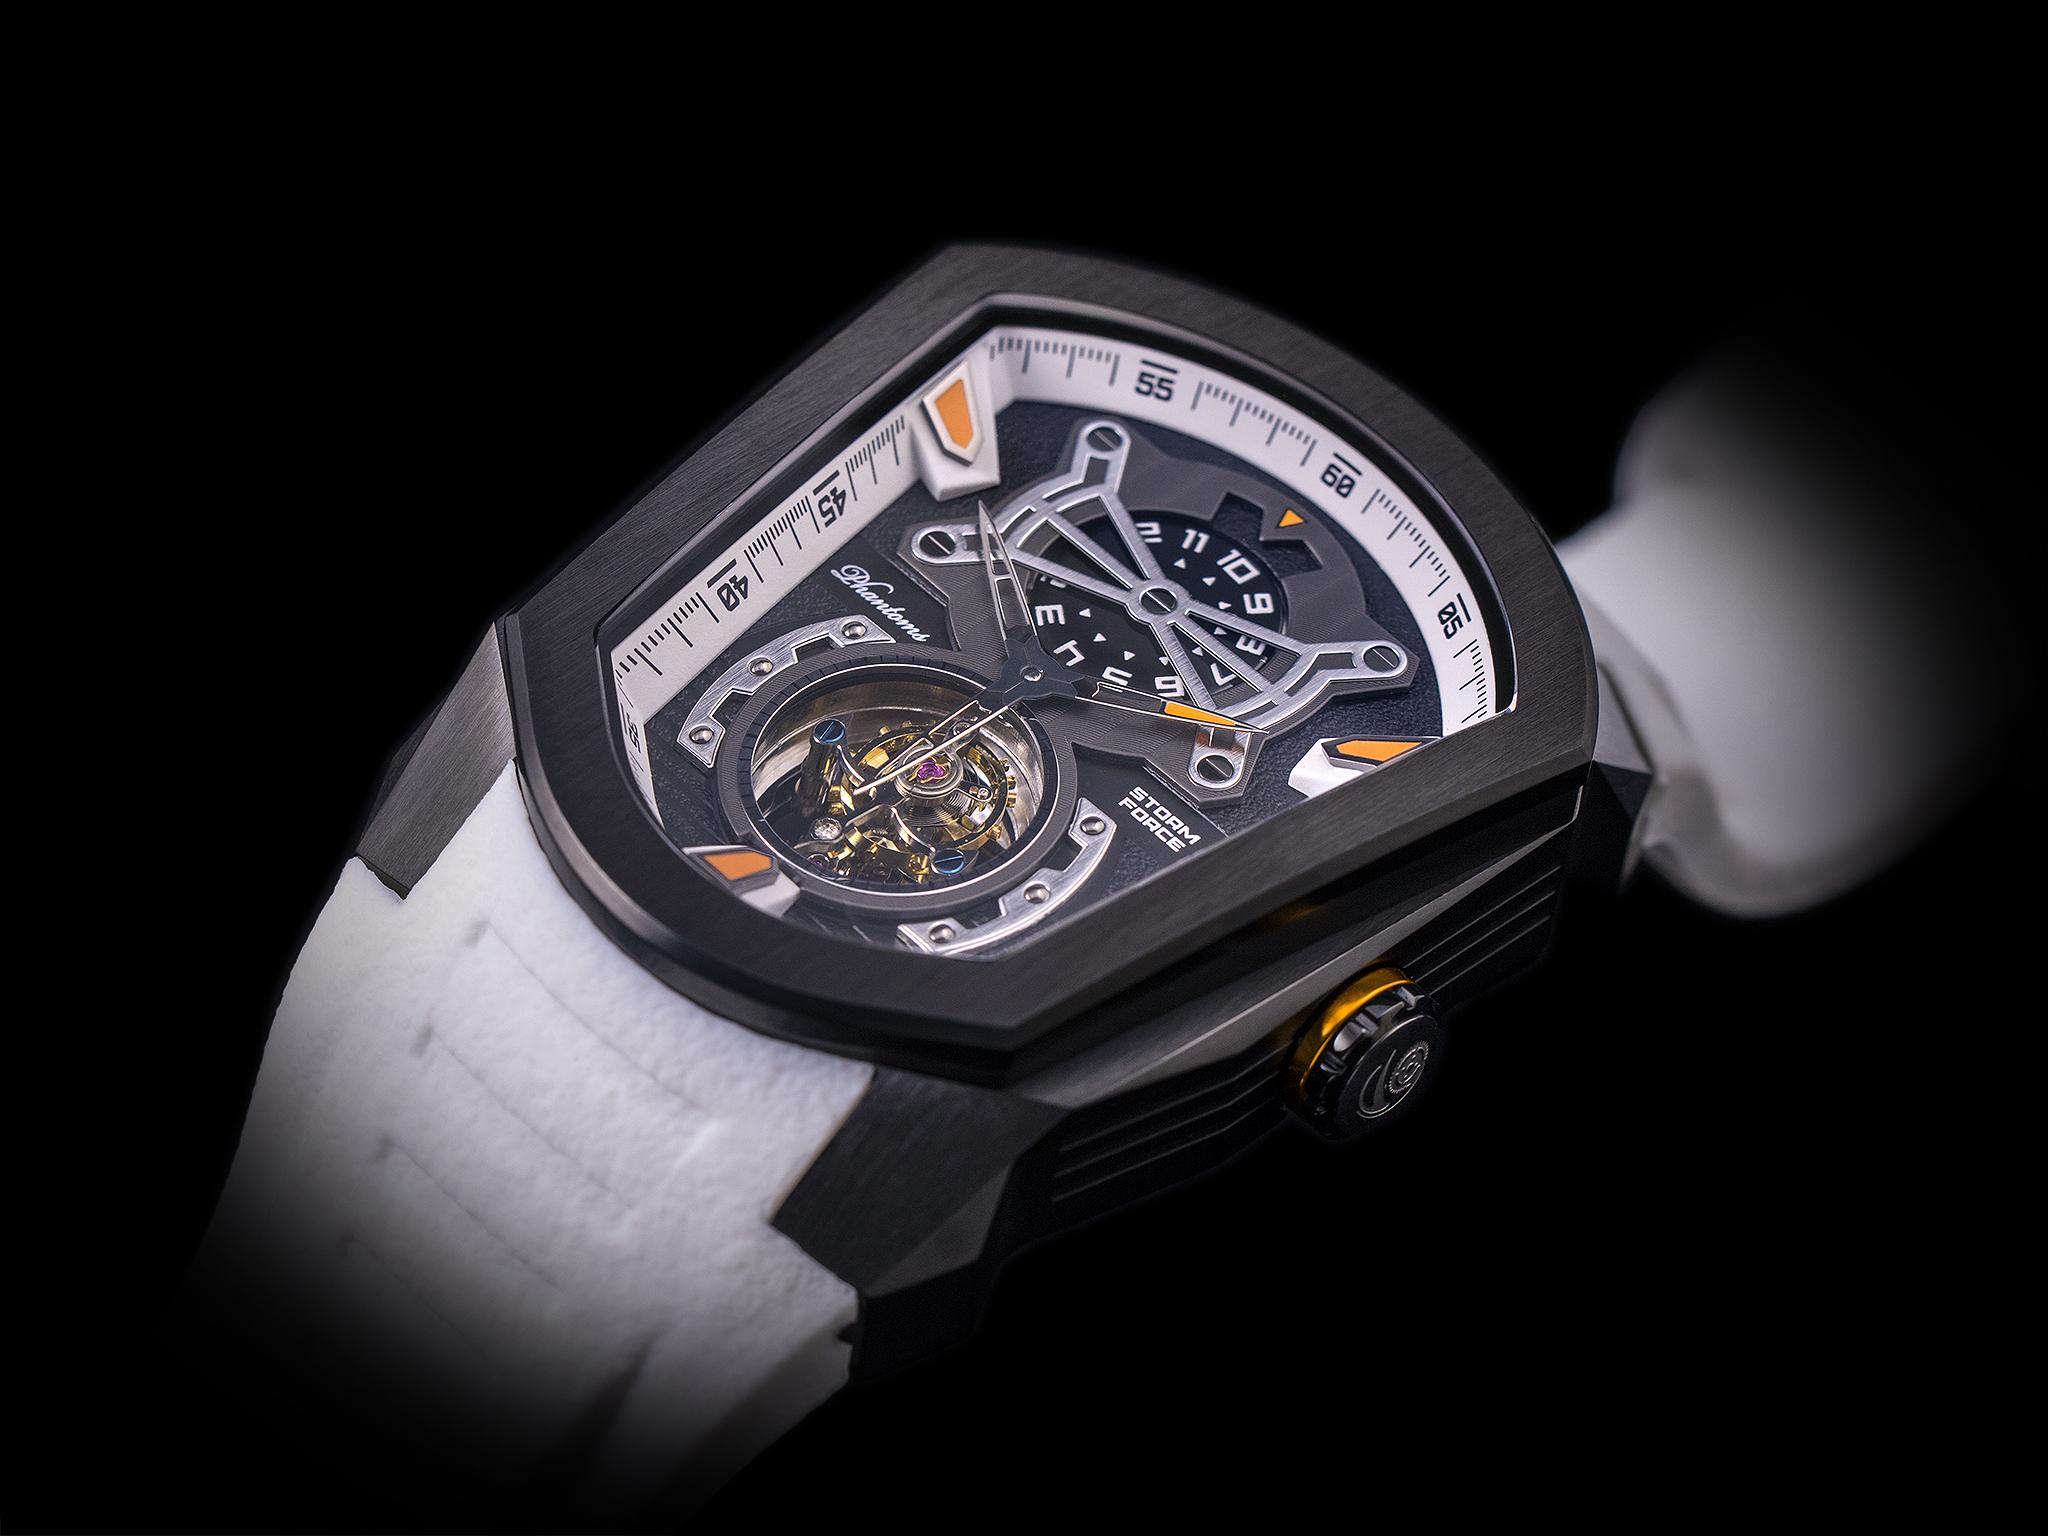 Phantoms Storm Force Flying Tourbillon Mechanical Watch